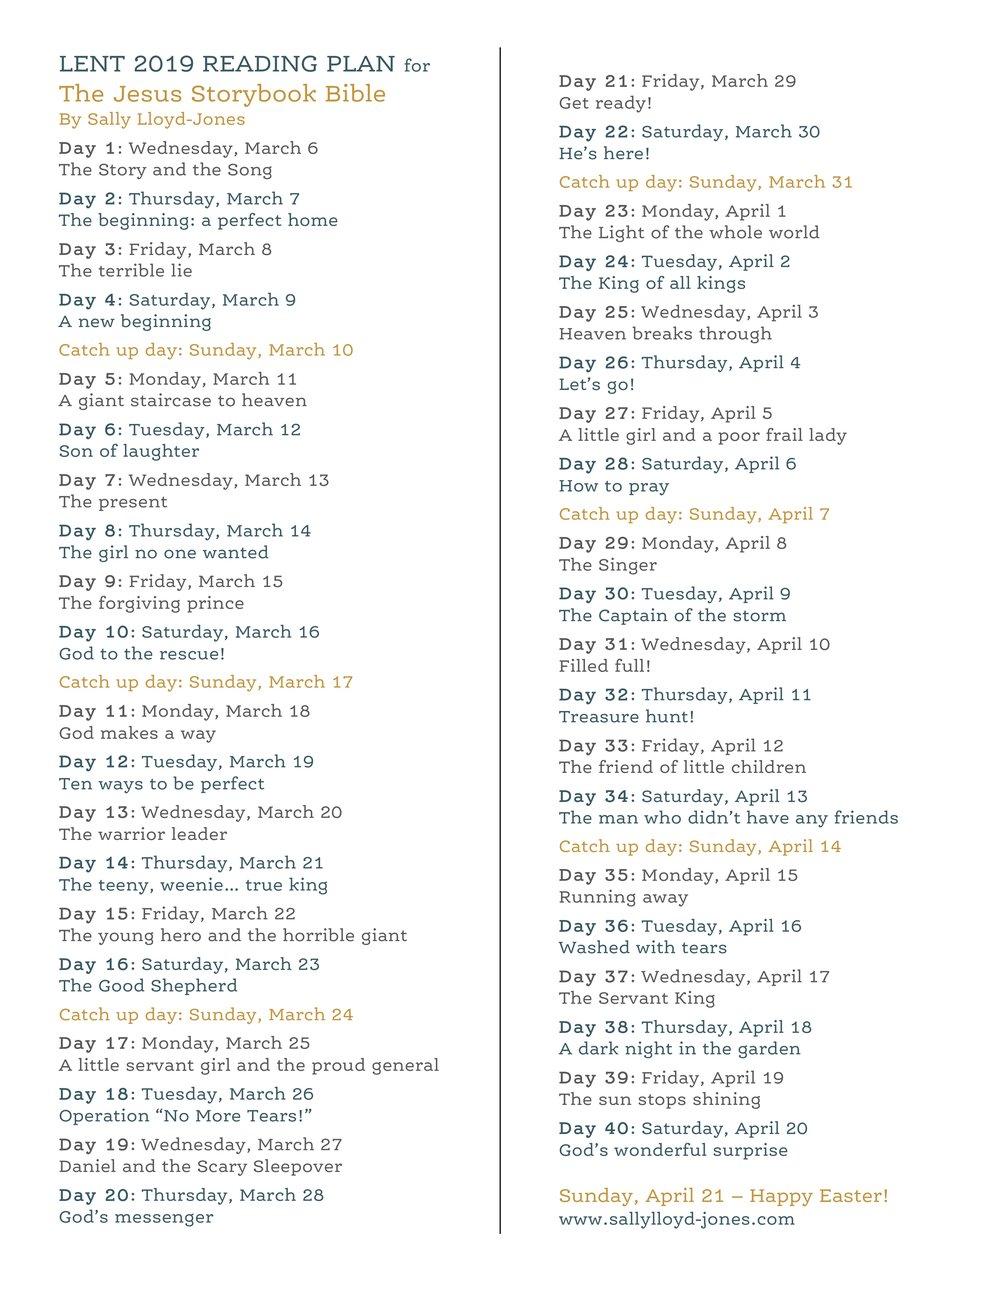 The_Jesus_Storybook_Bible_Lent_2019_Printable_Reading_Guide_by_Sally_Lloyd_Jones3.jpg